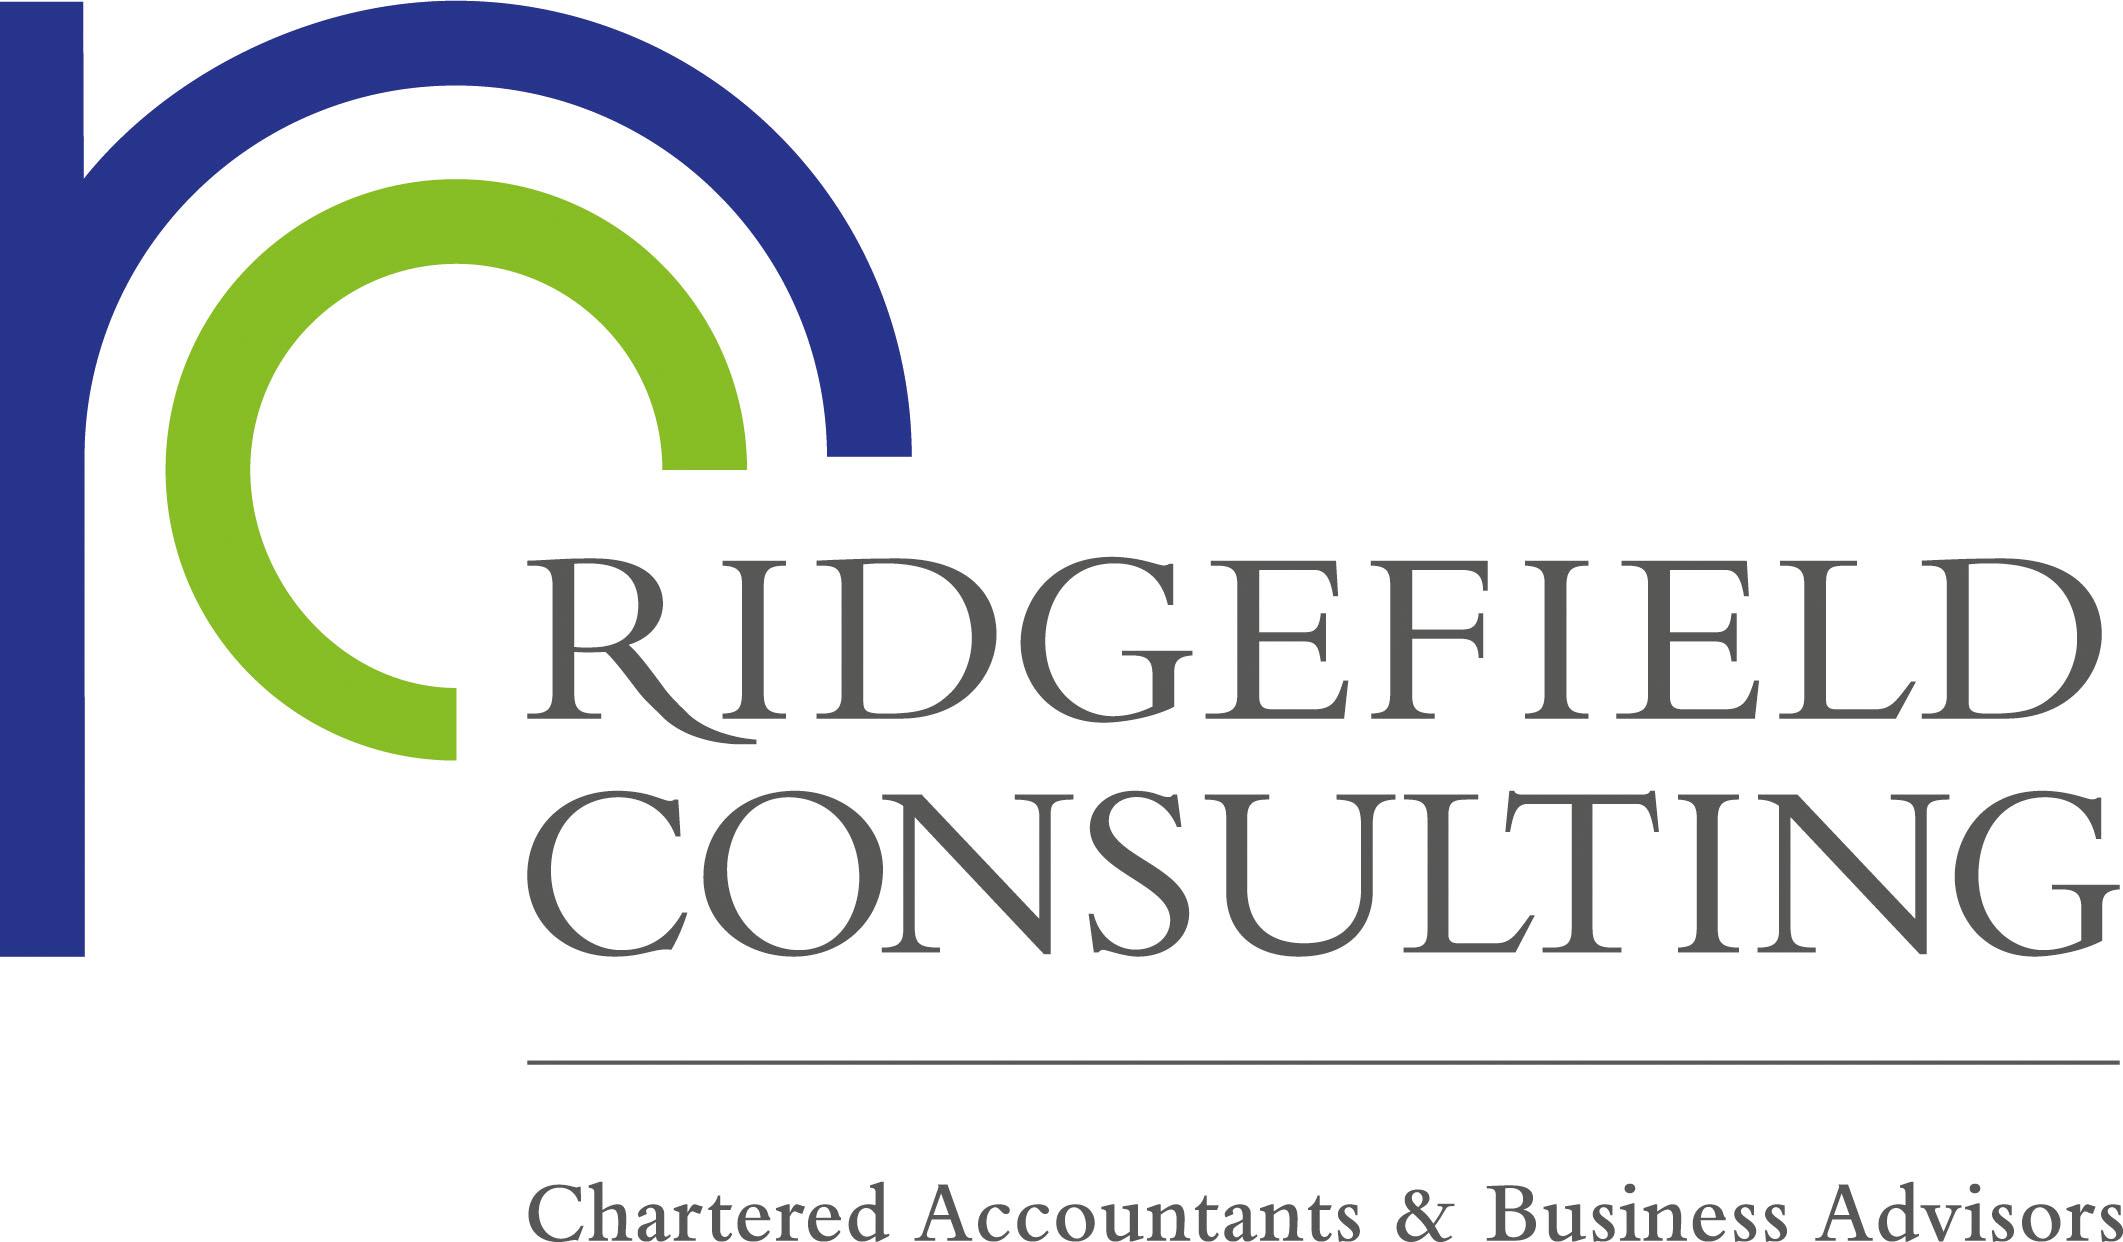 Ridgefield Consulting Ltd.